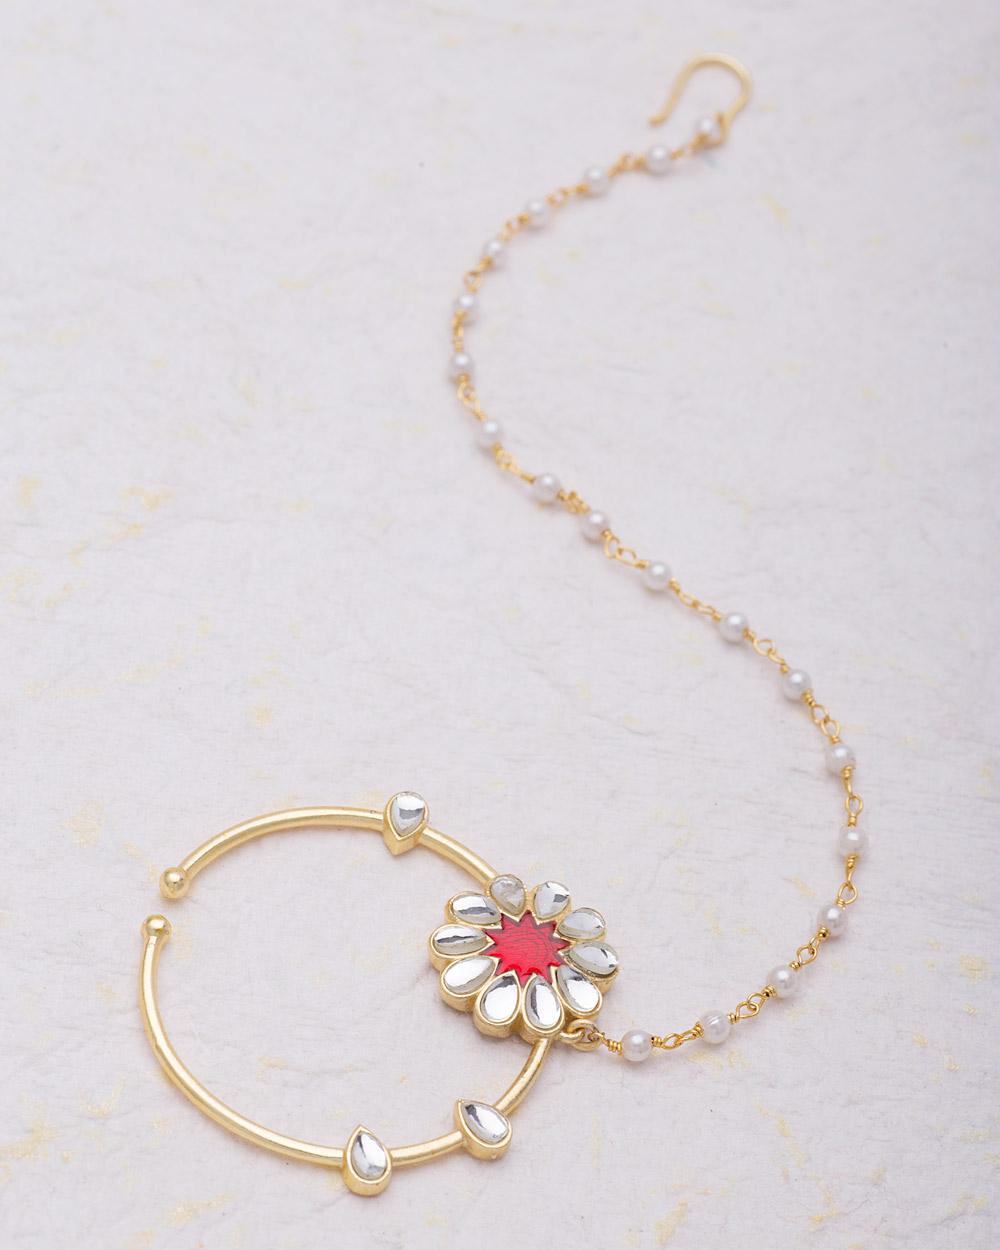 Buy Kundan and Pearl Embellished Floral Nath Online India | Voylla